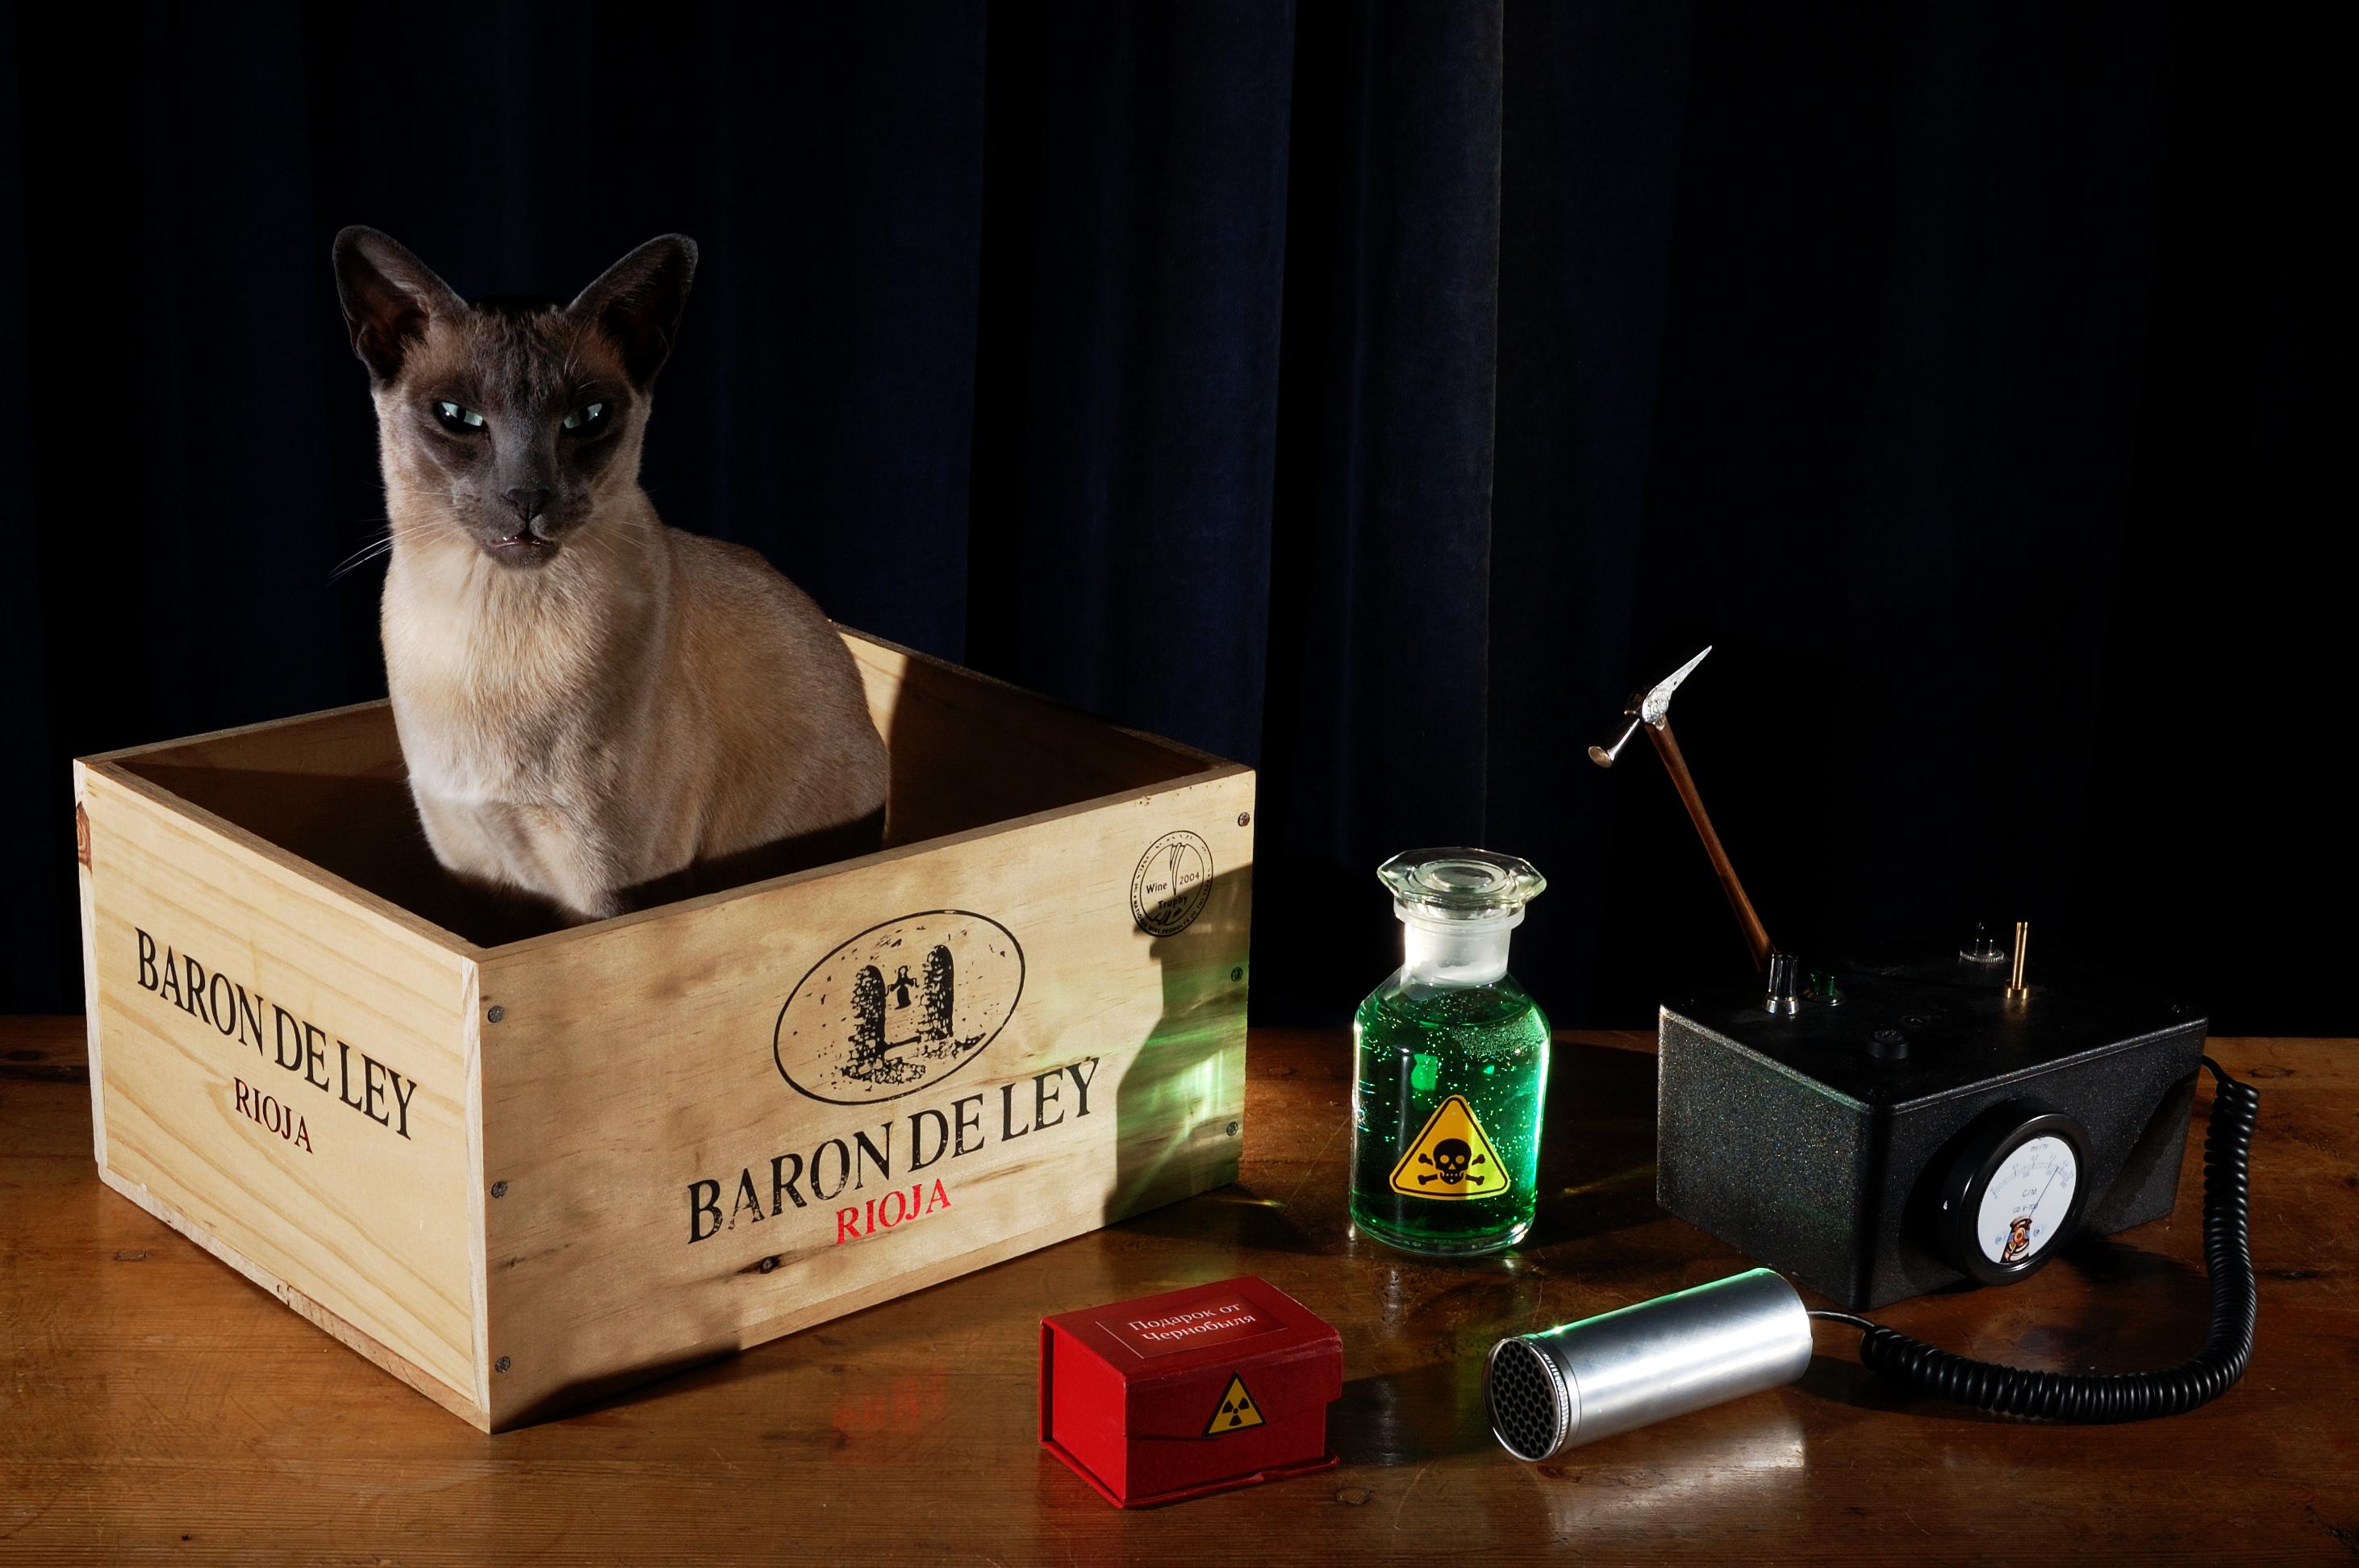 Gato Schrödinger real